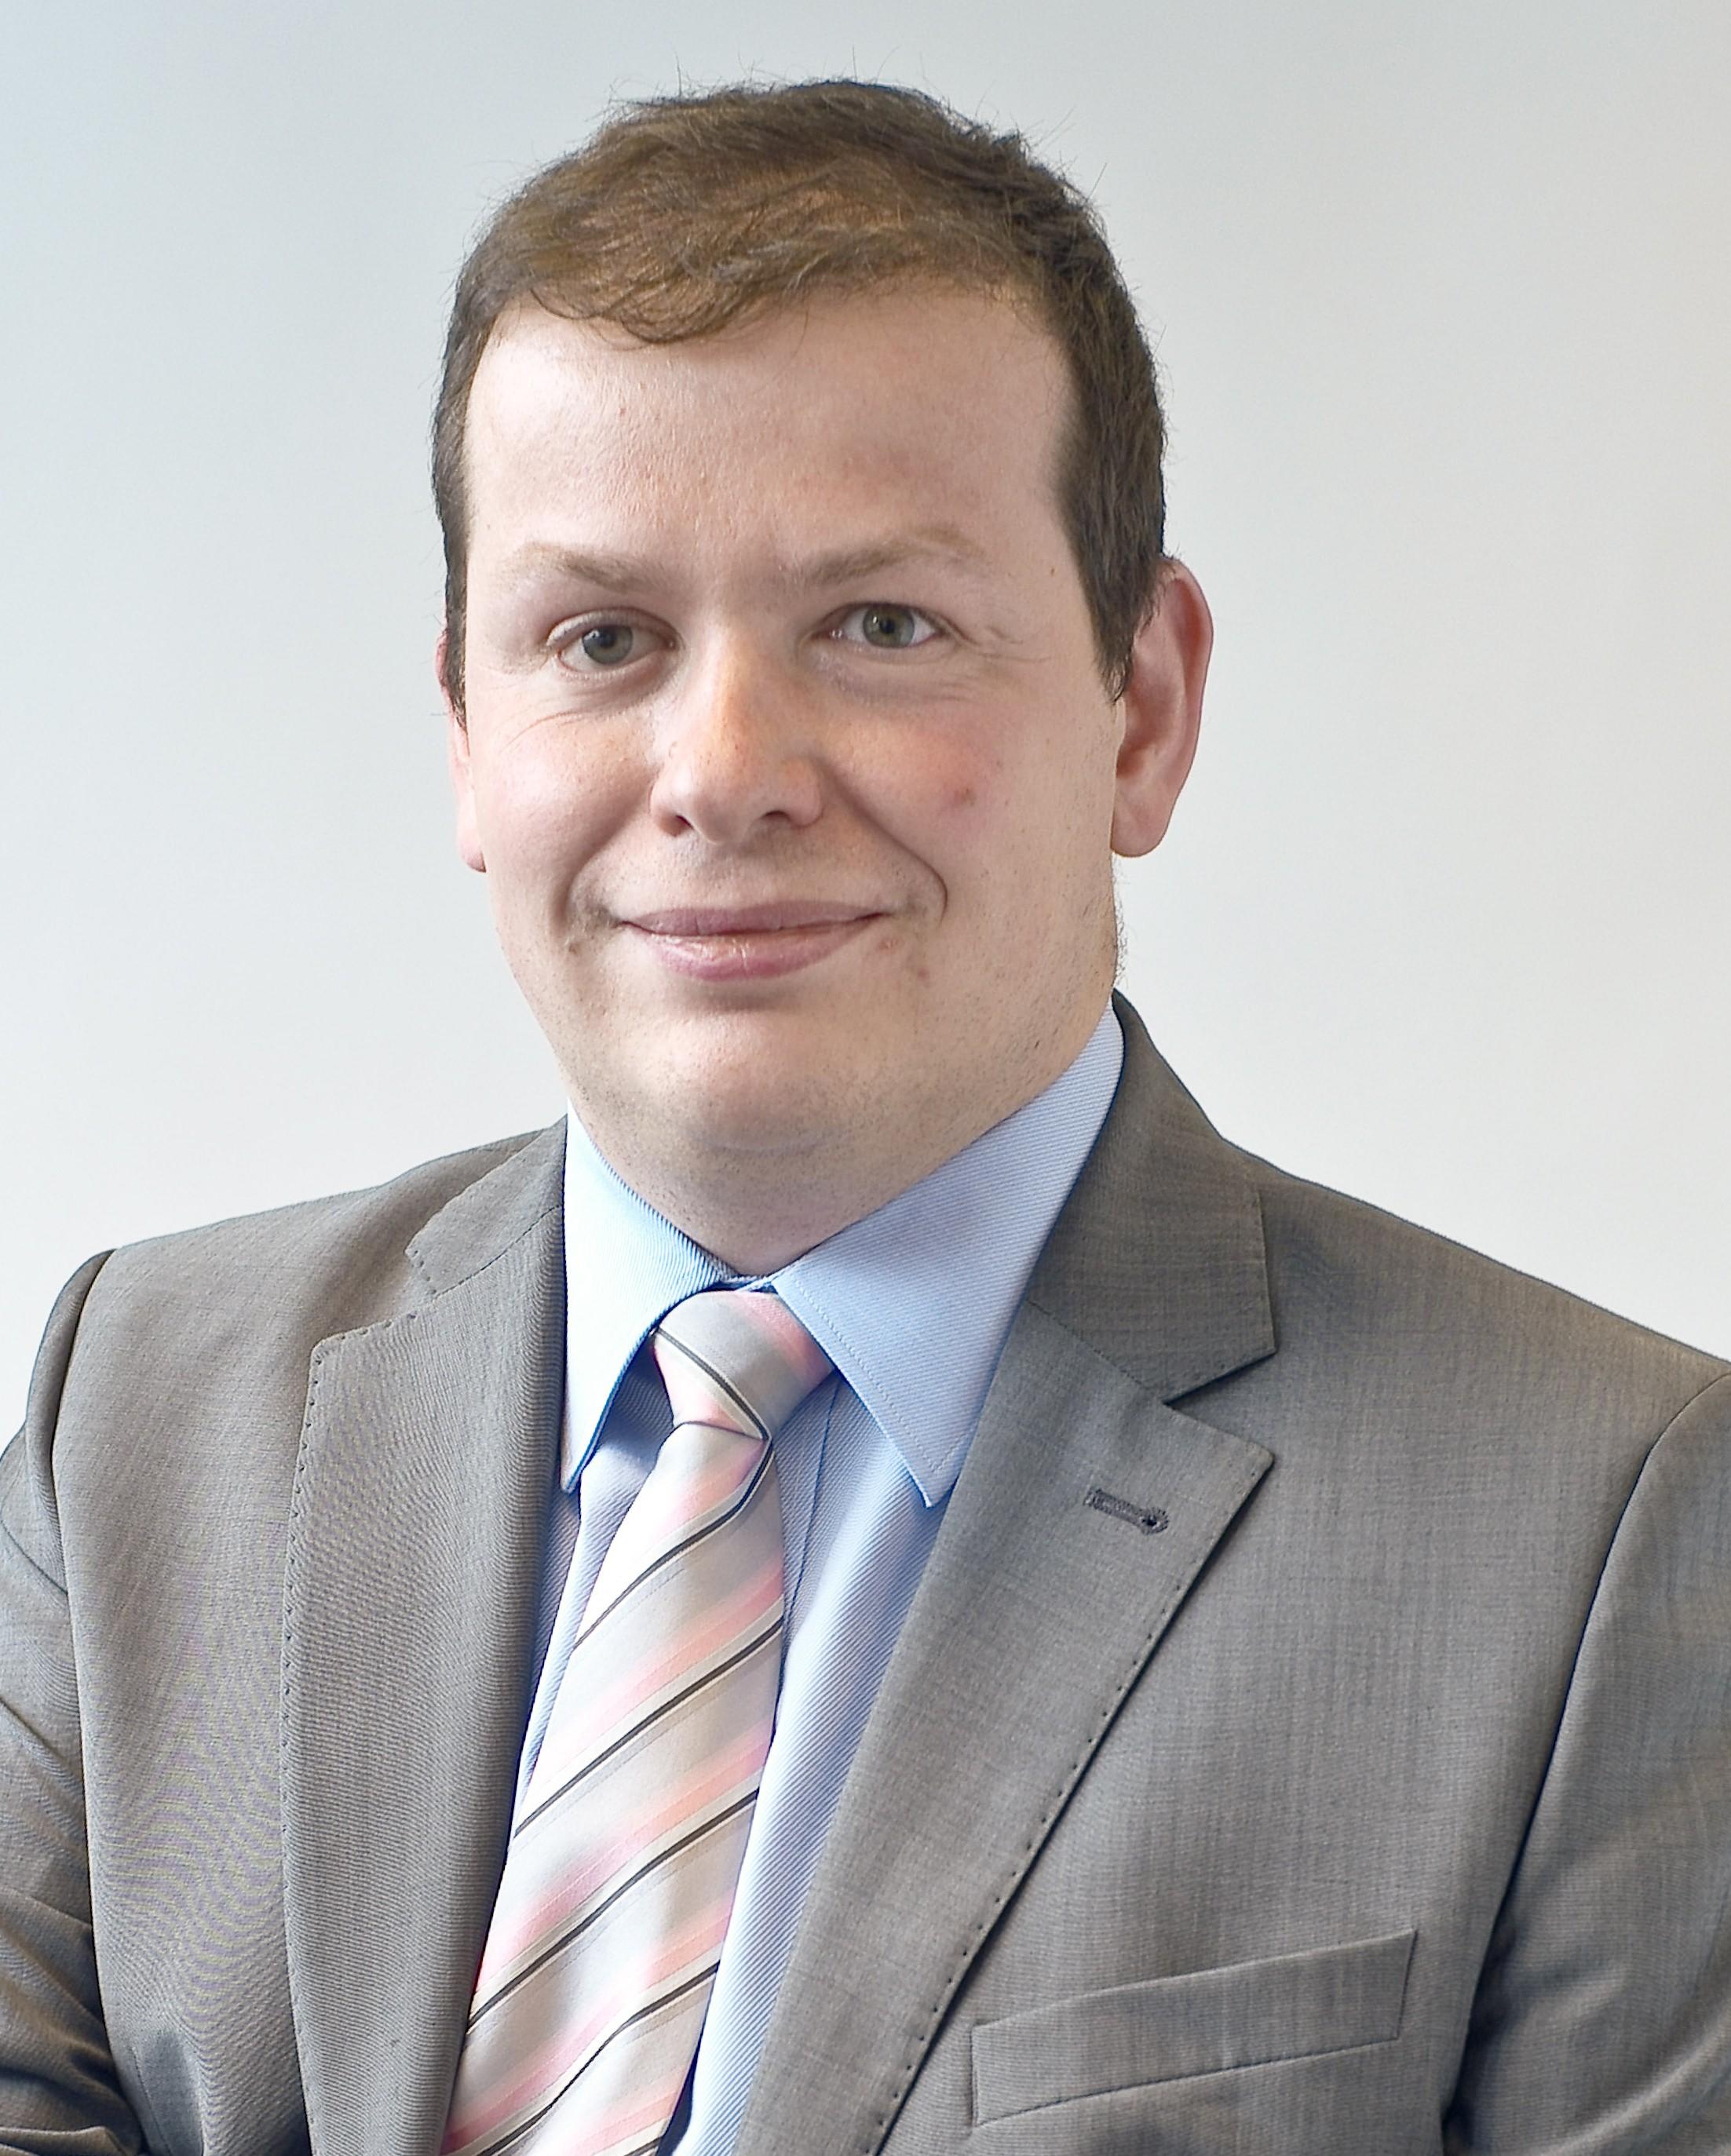 Jean-Michel Huet